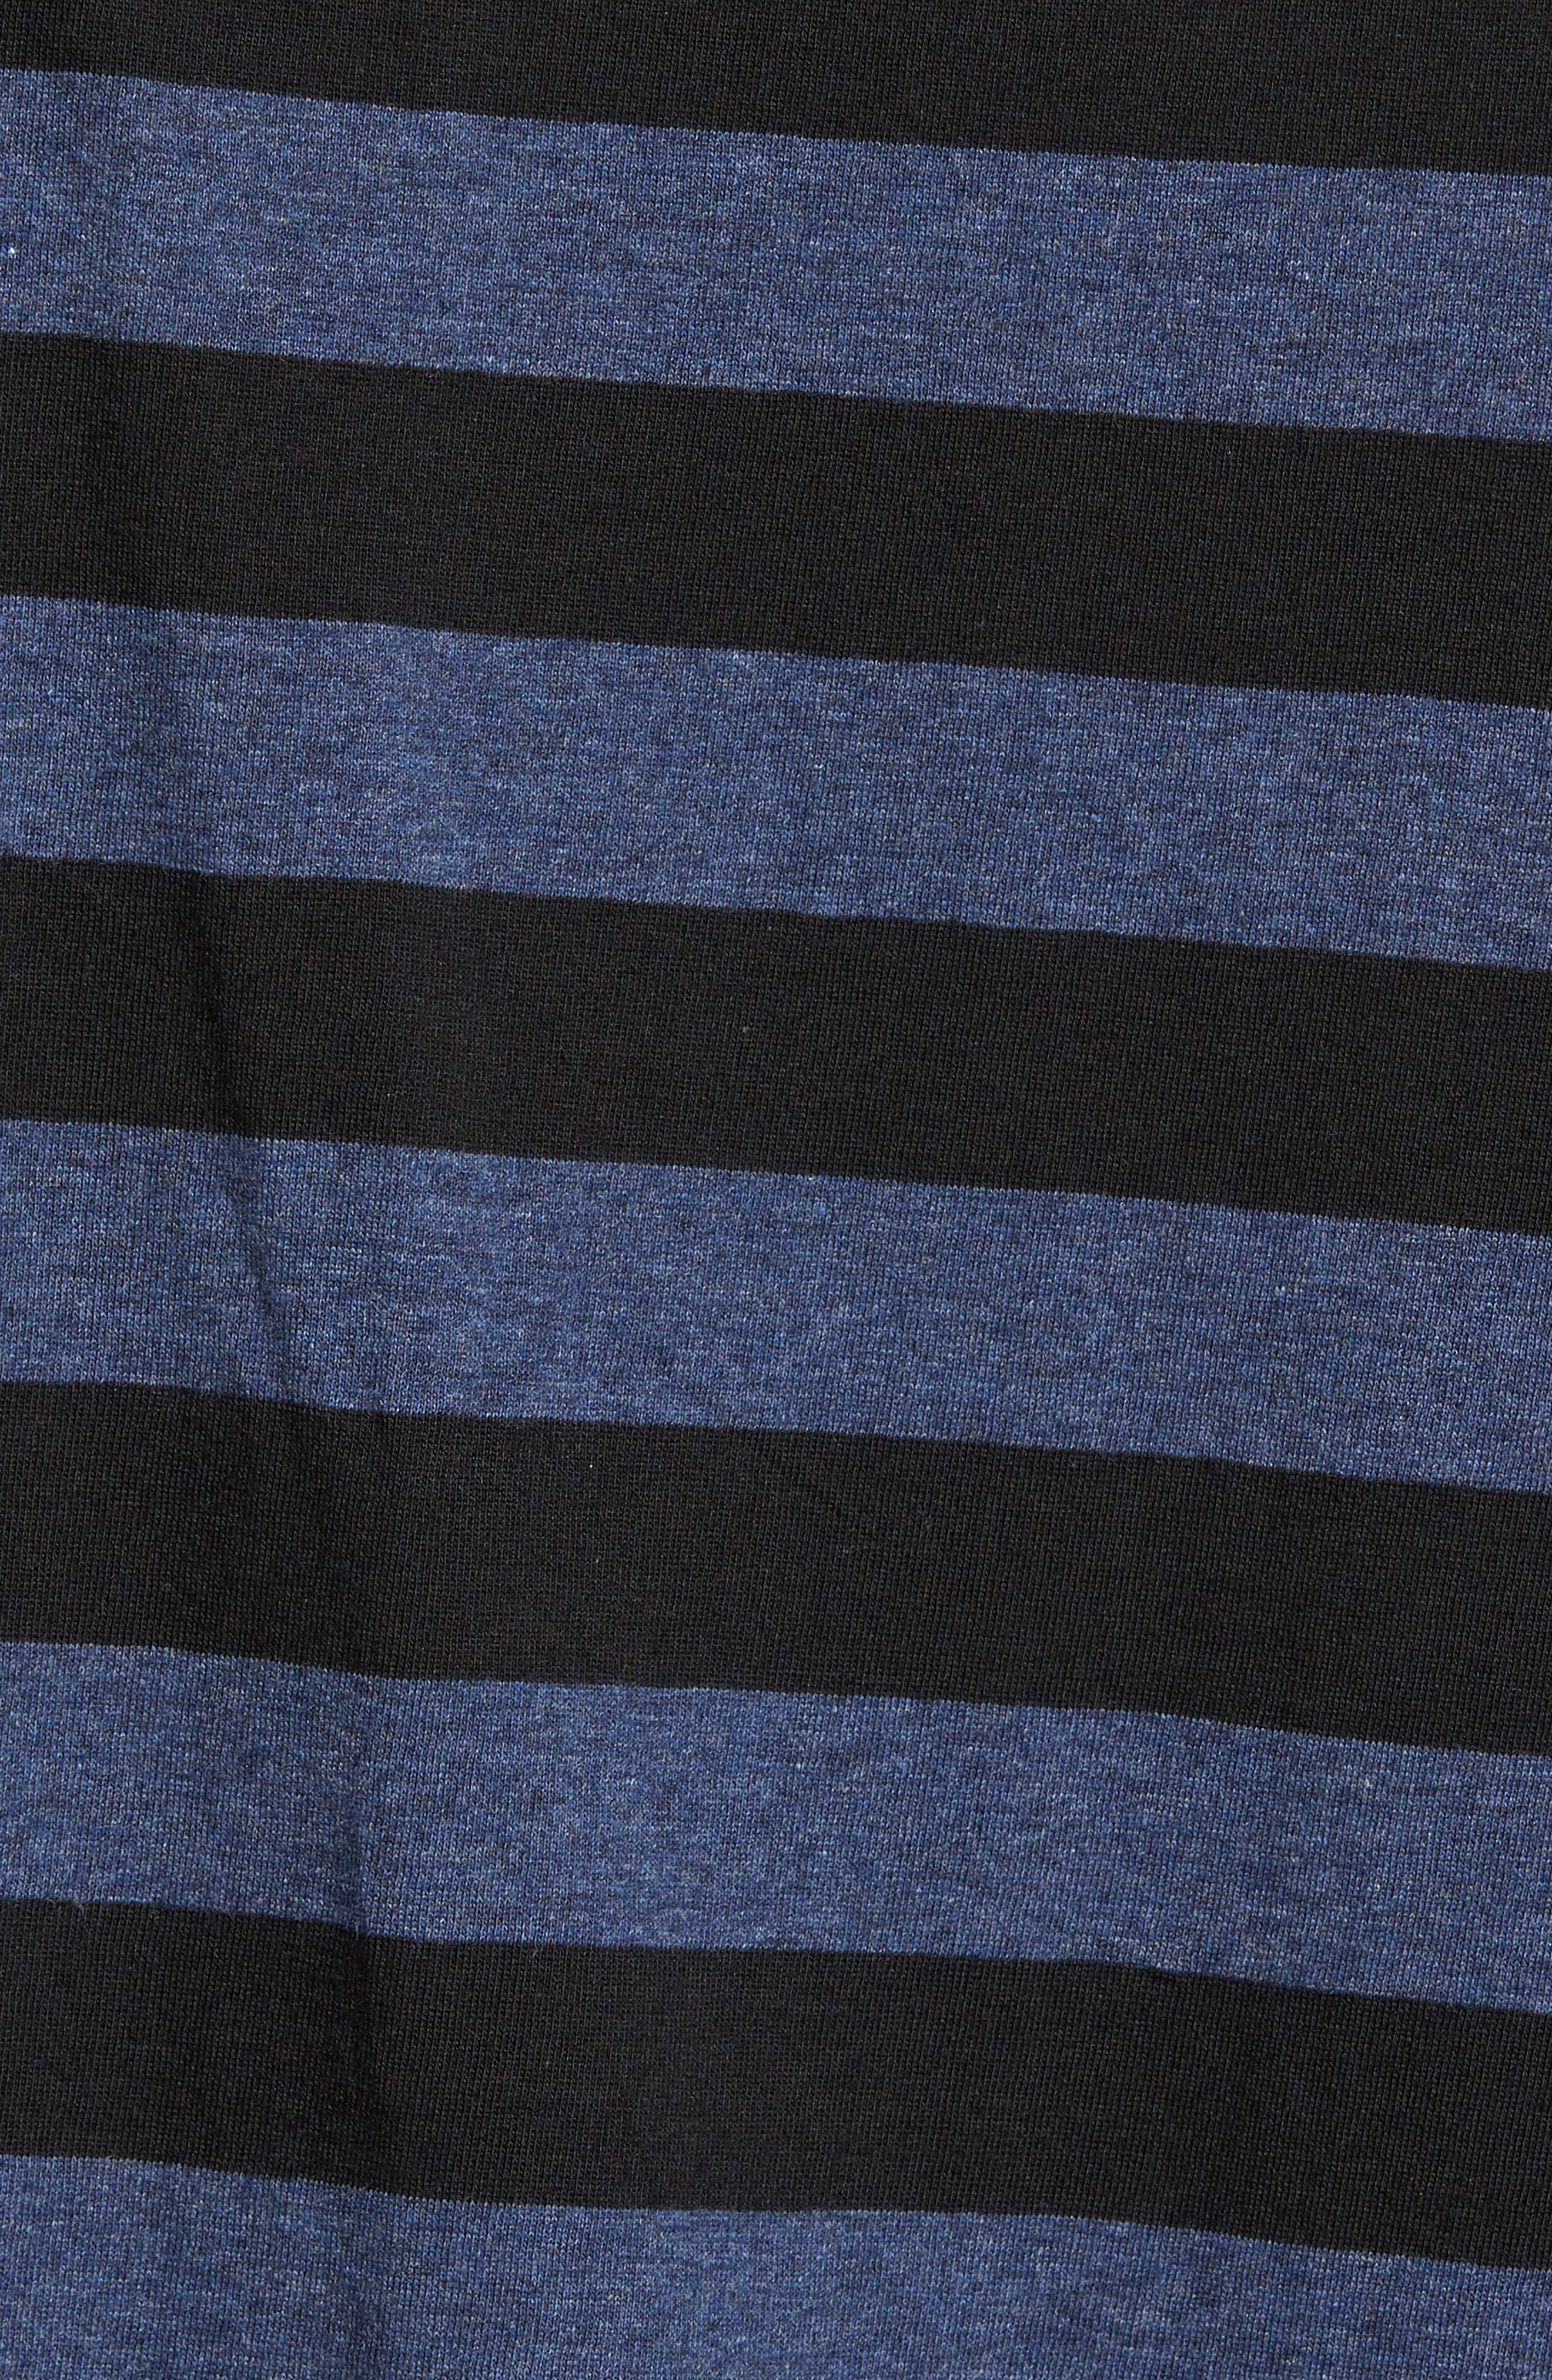 Striped Long Sleeve Henley T-Shirt,                             Alternate thumbnail 5, color,